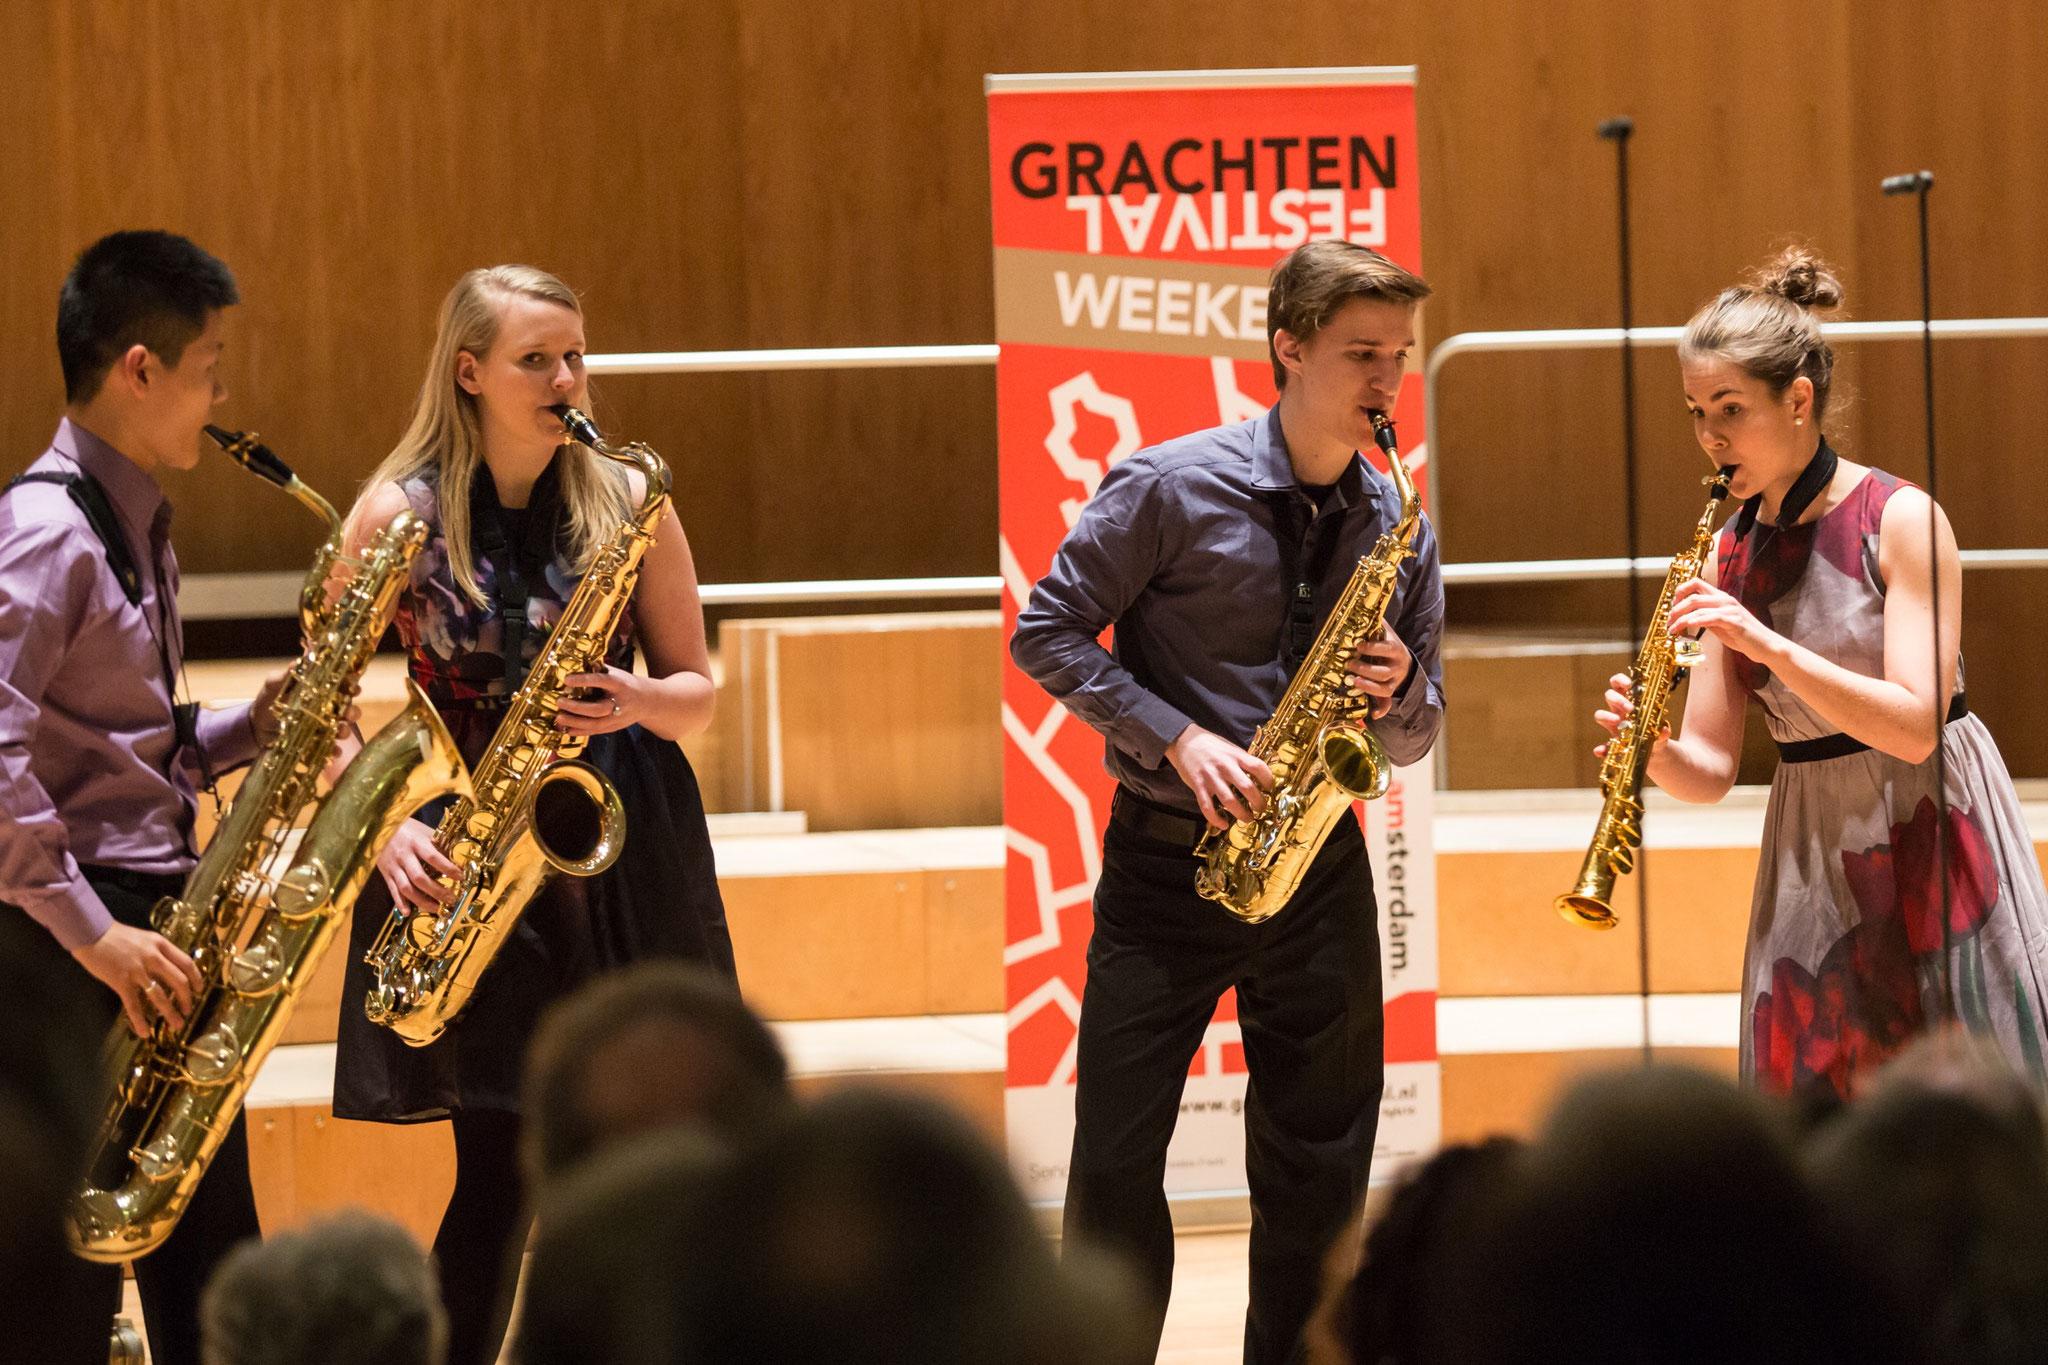 Grachtenfestival Conservatorium Concours, NedPho Koepel Amsterdam 2016